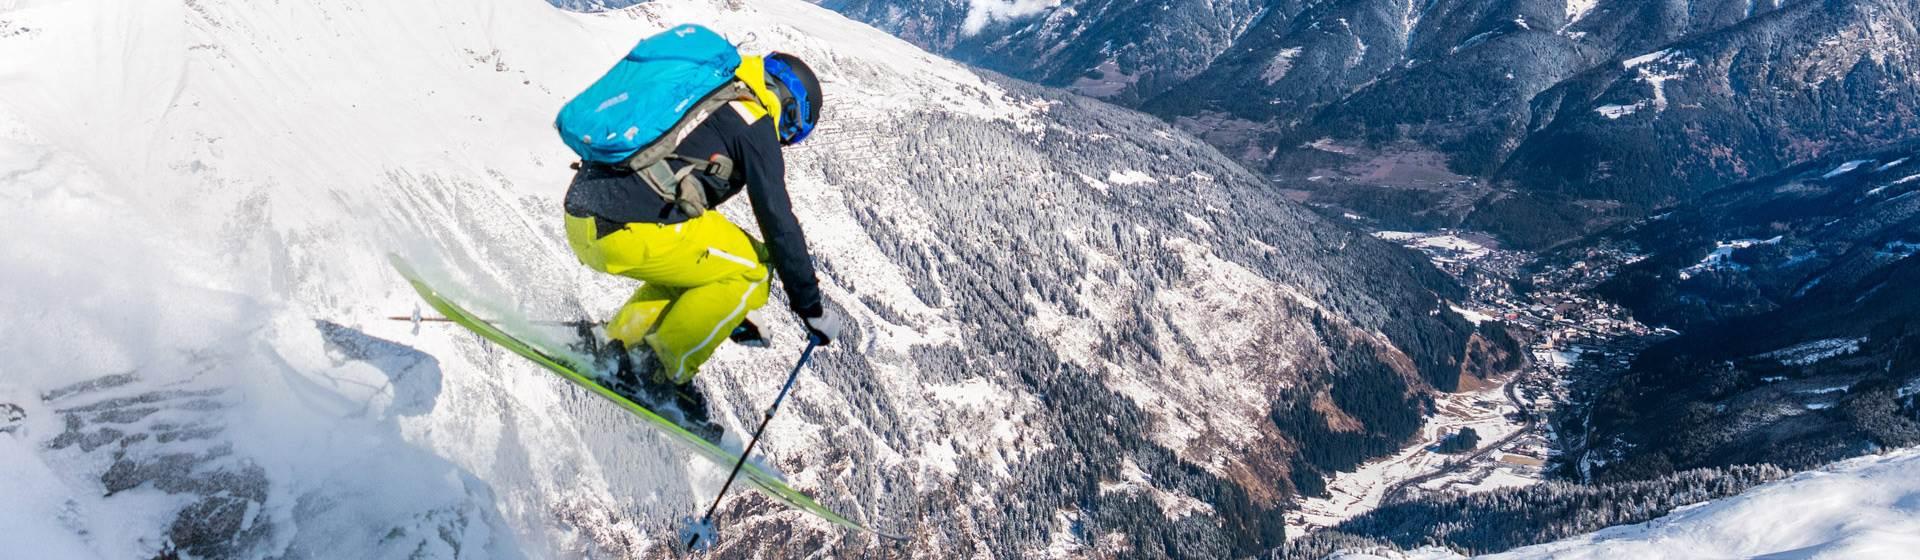 Skifahrer springt mit Blick ins Tal